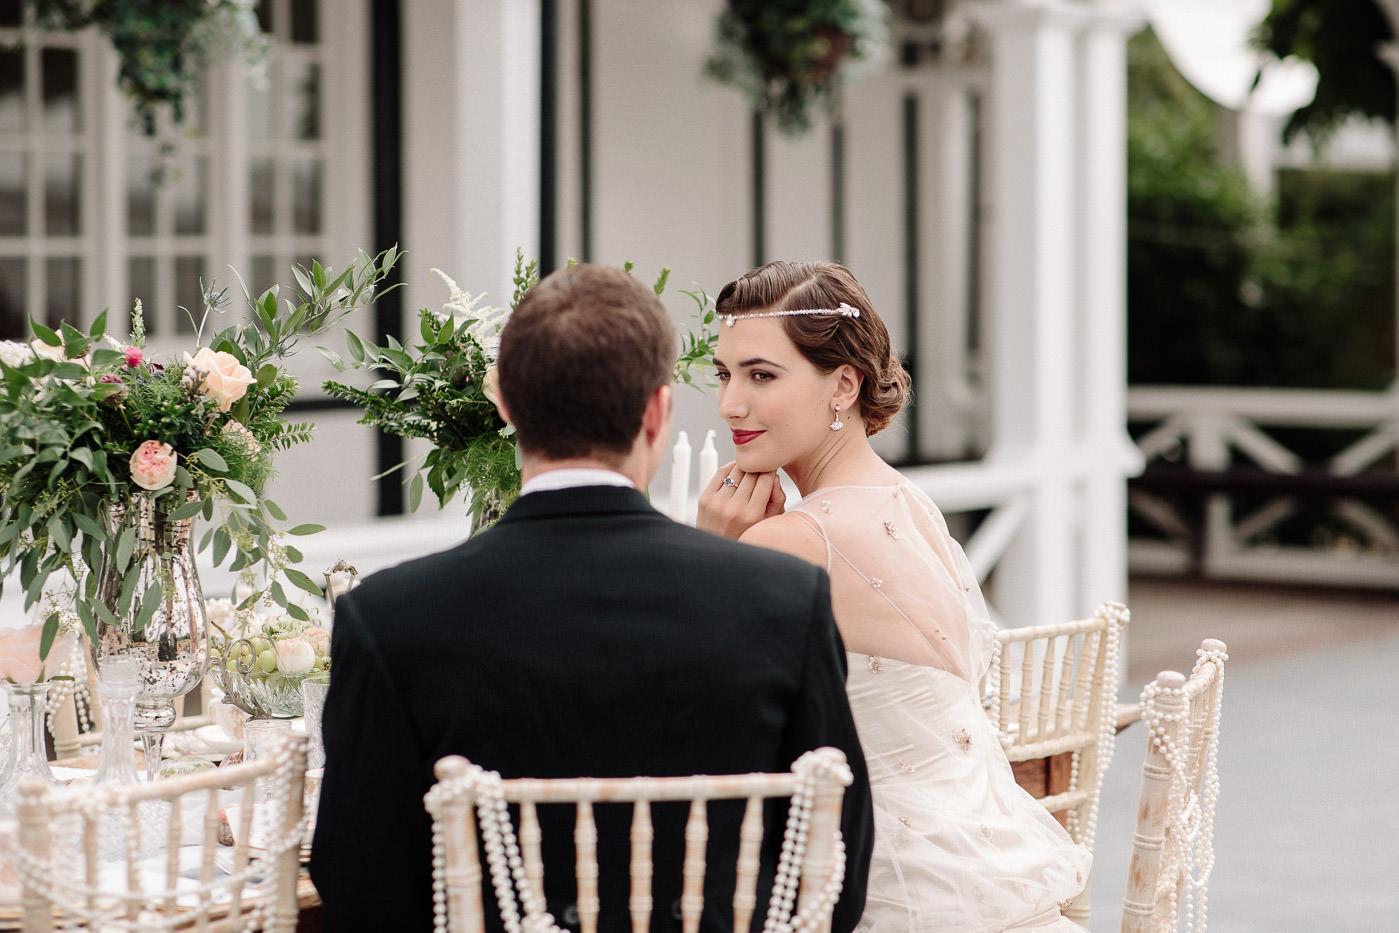 wedding-photographer-hertfordshire-49.jpg